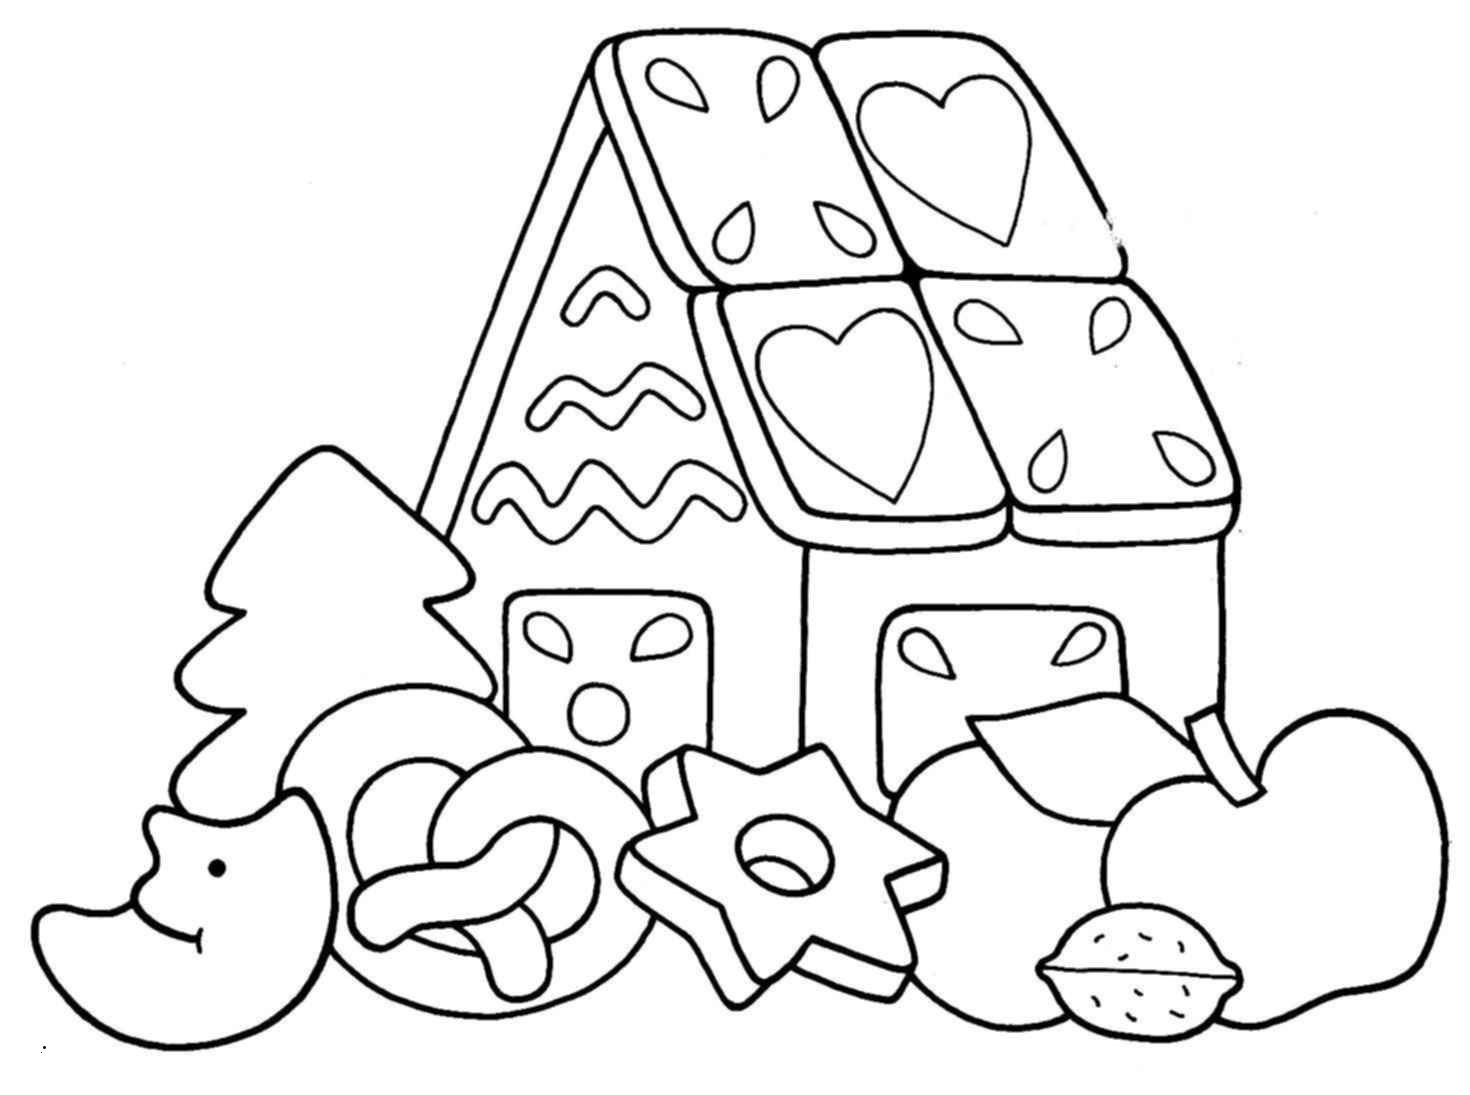 Micky Maus Malvorlage Frisch 36 Entwurf Mickey Maus Ausmalbilder Treehouse Nyc Stock